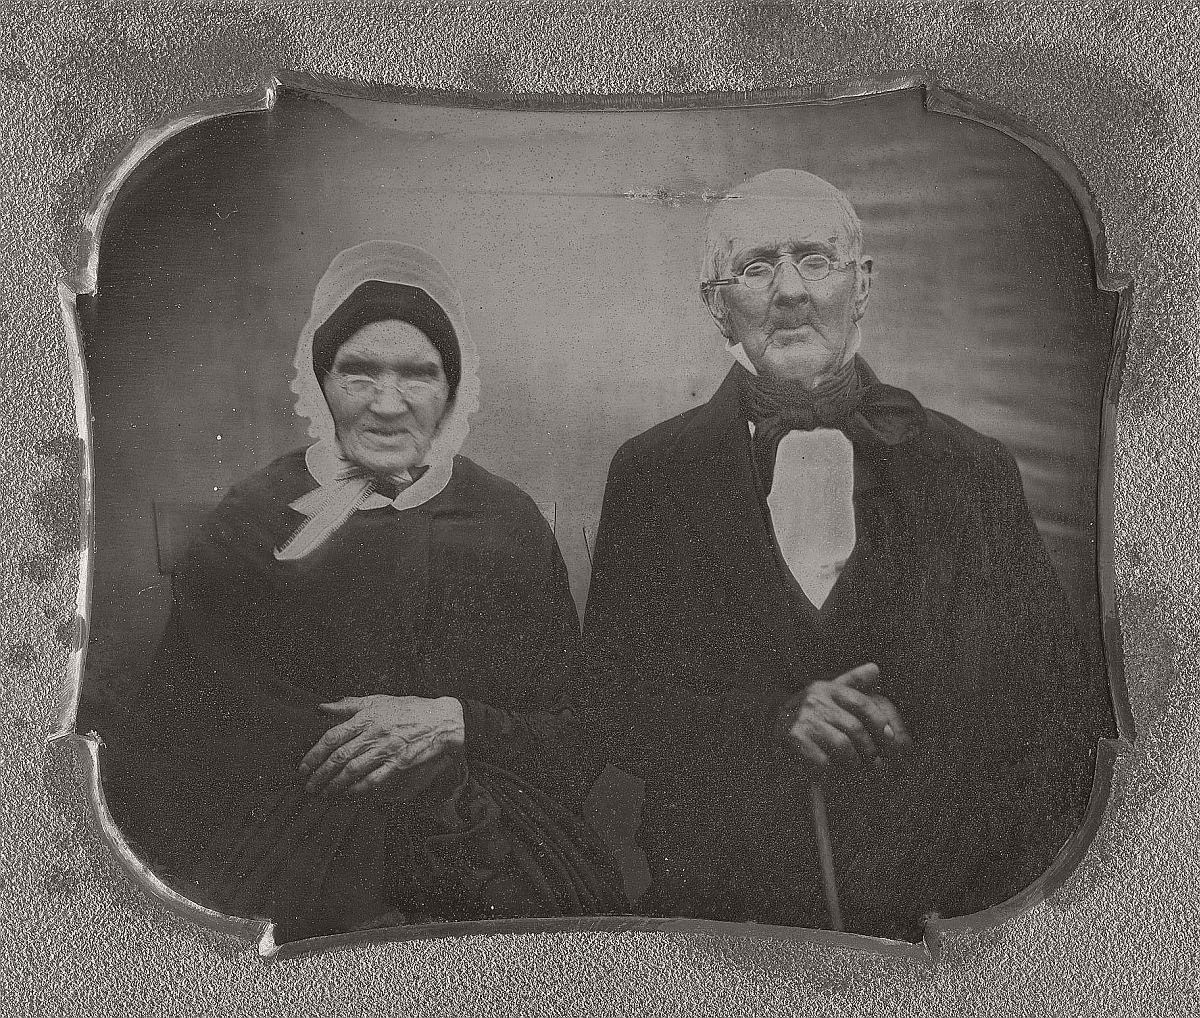 daguerreotype-portrait-people-born-in-the-late-18th-xviii-century-1700s-vintage-37